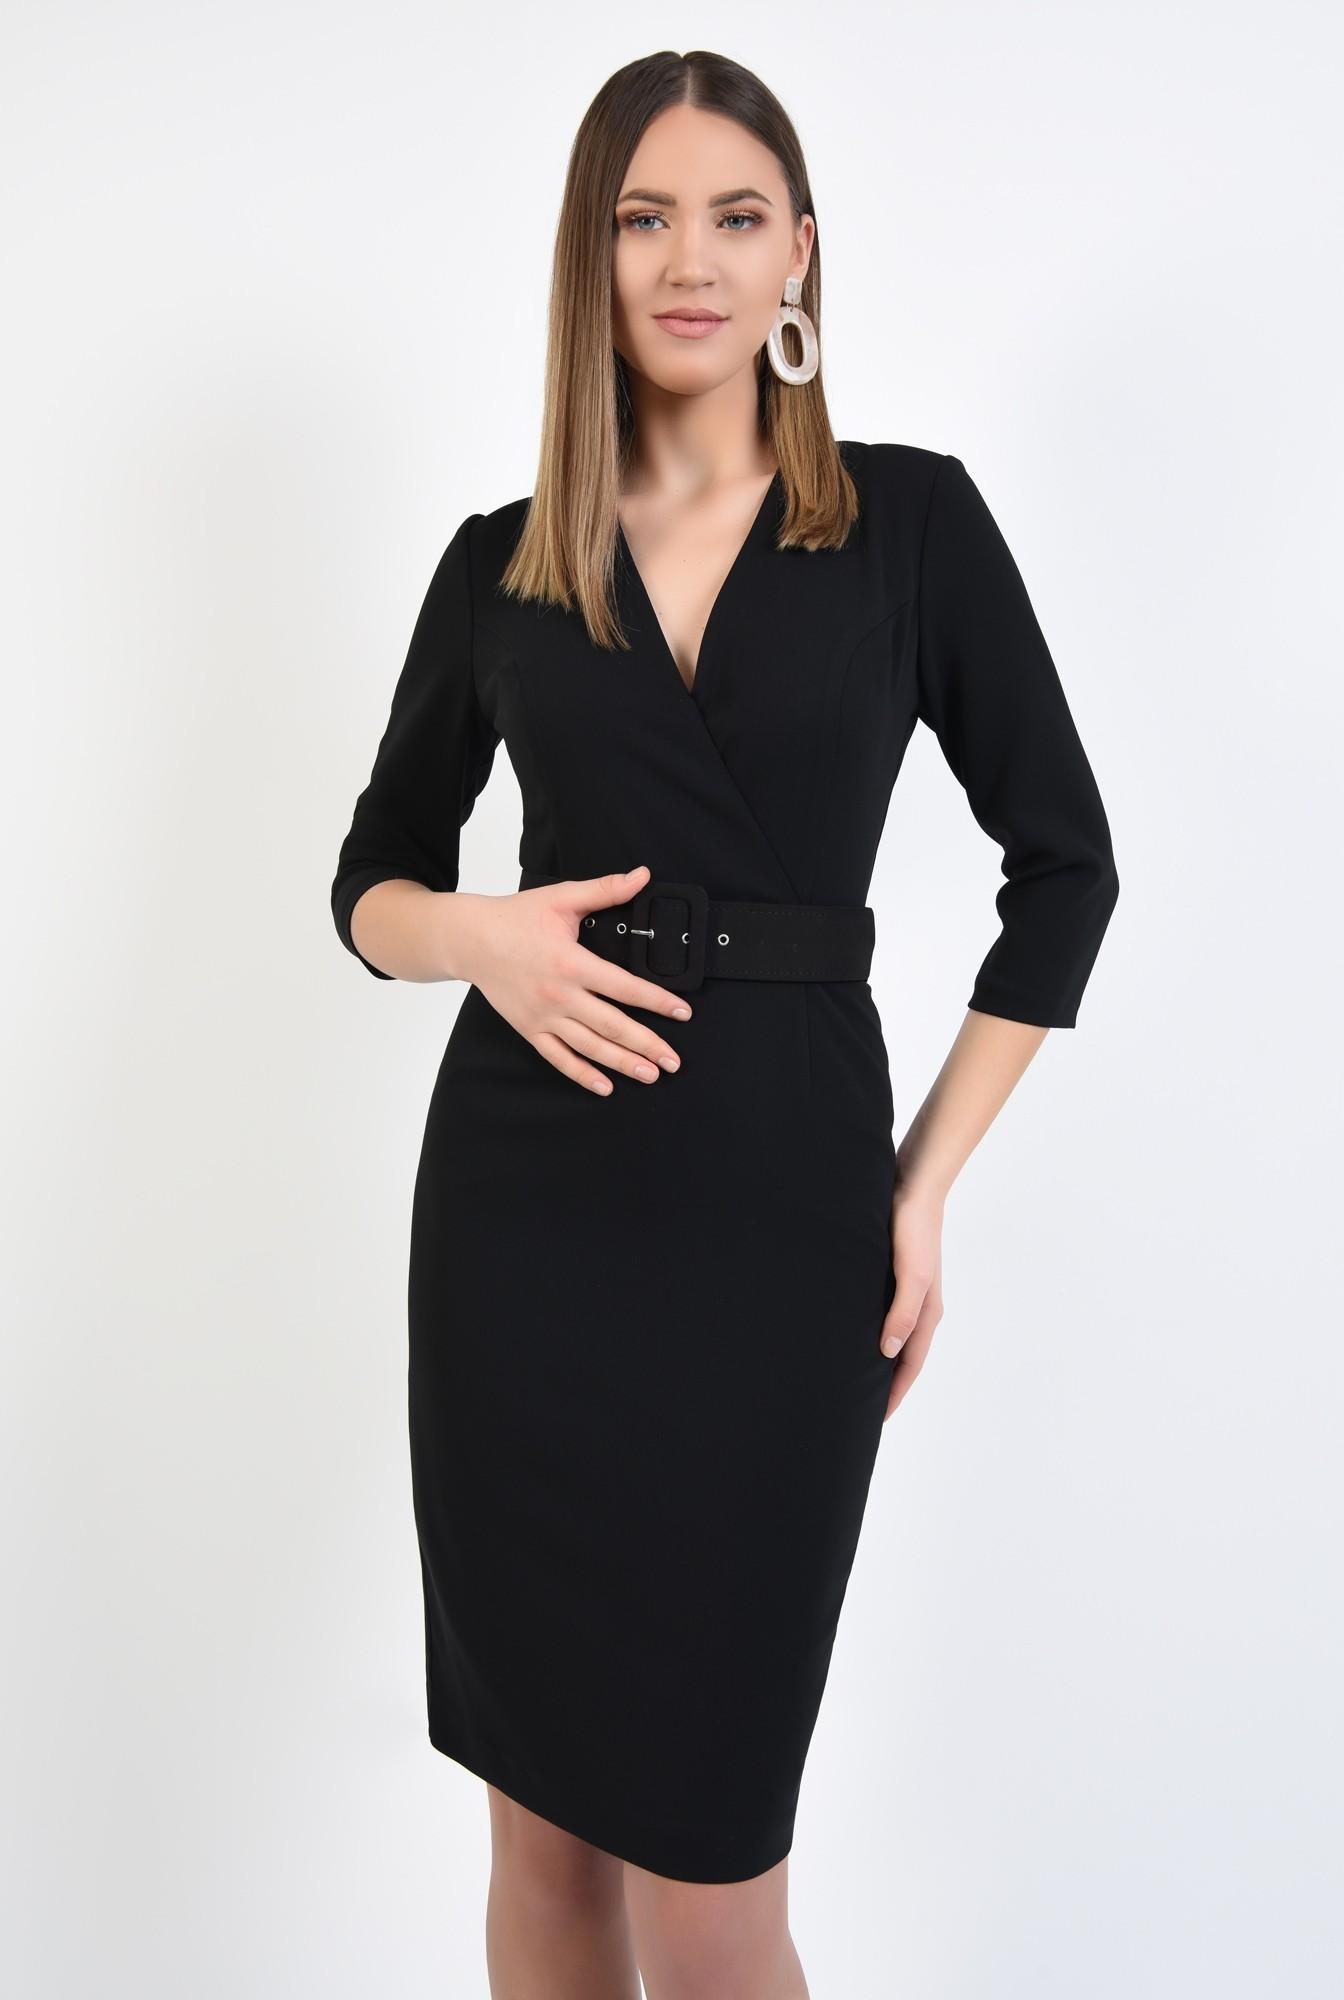 2 - rochie neagra, office, conica, cu centura